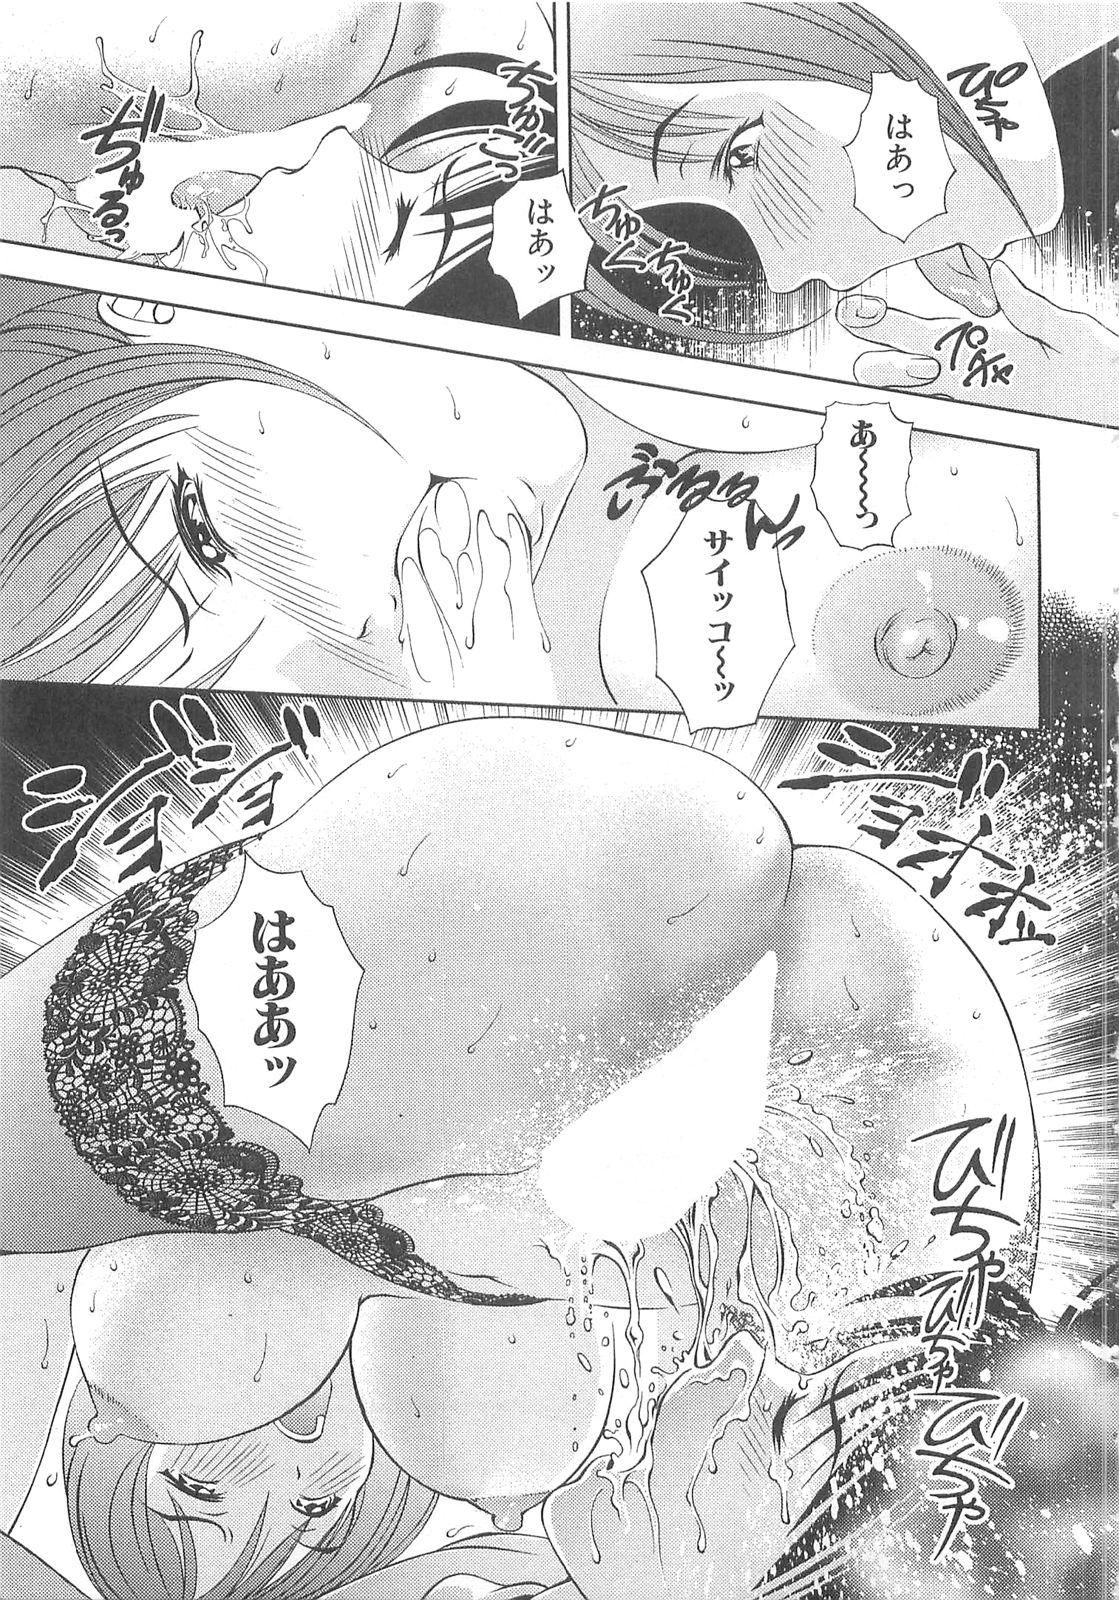 Tenshi no Kyuu - Angel's Pretty Hip 135